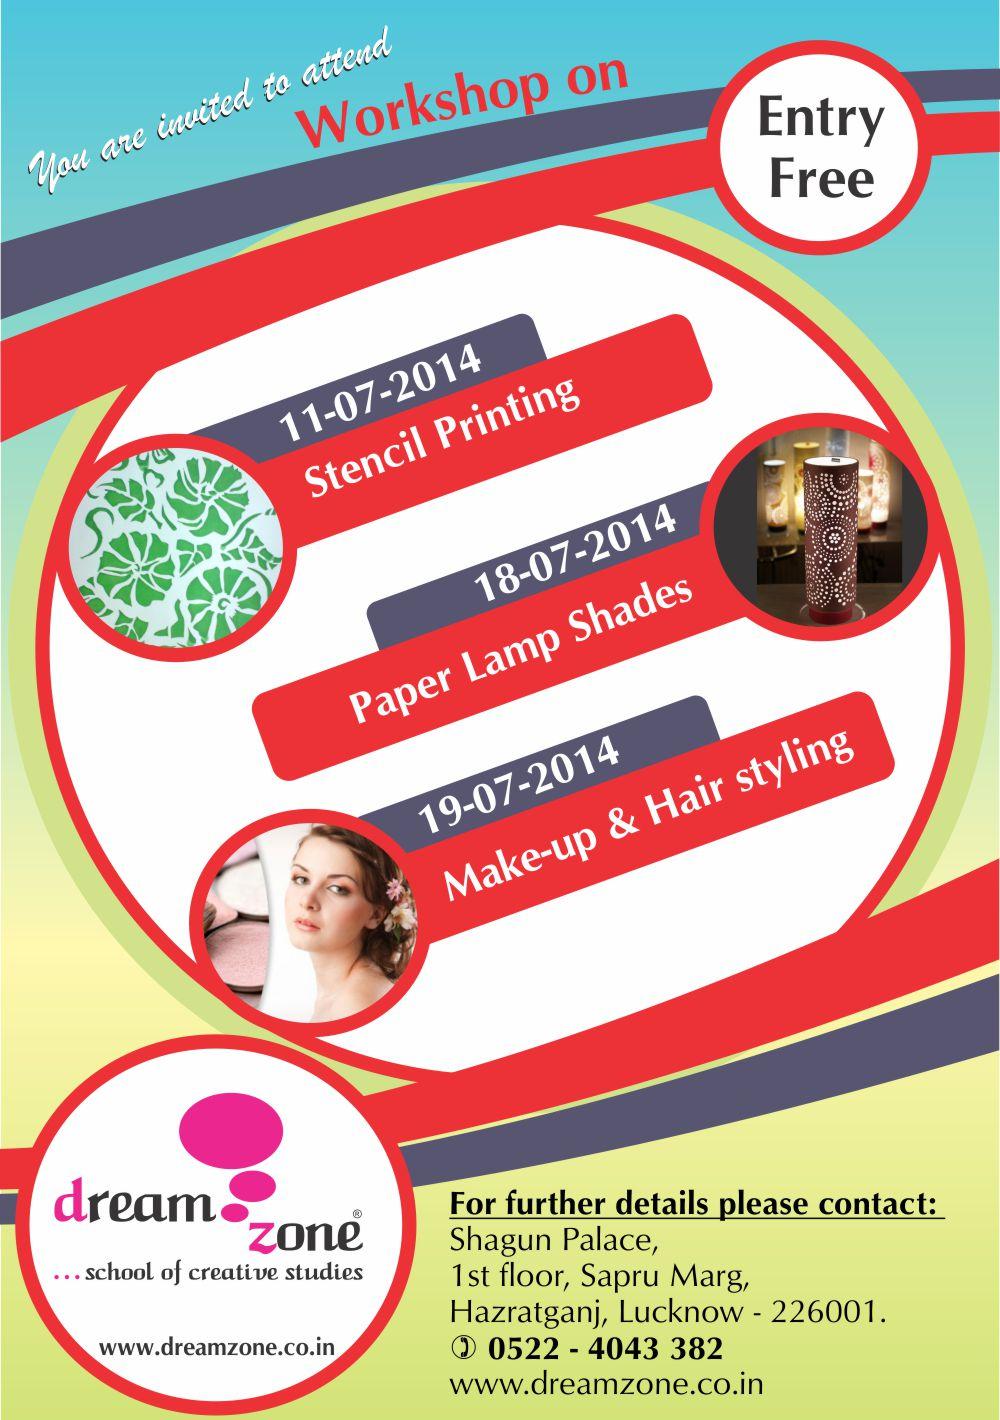 Dream Zone Hazratganj Workshop On Interior And Fashion Design Best Graphic Architecture Courses Training Institute